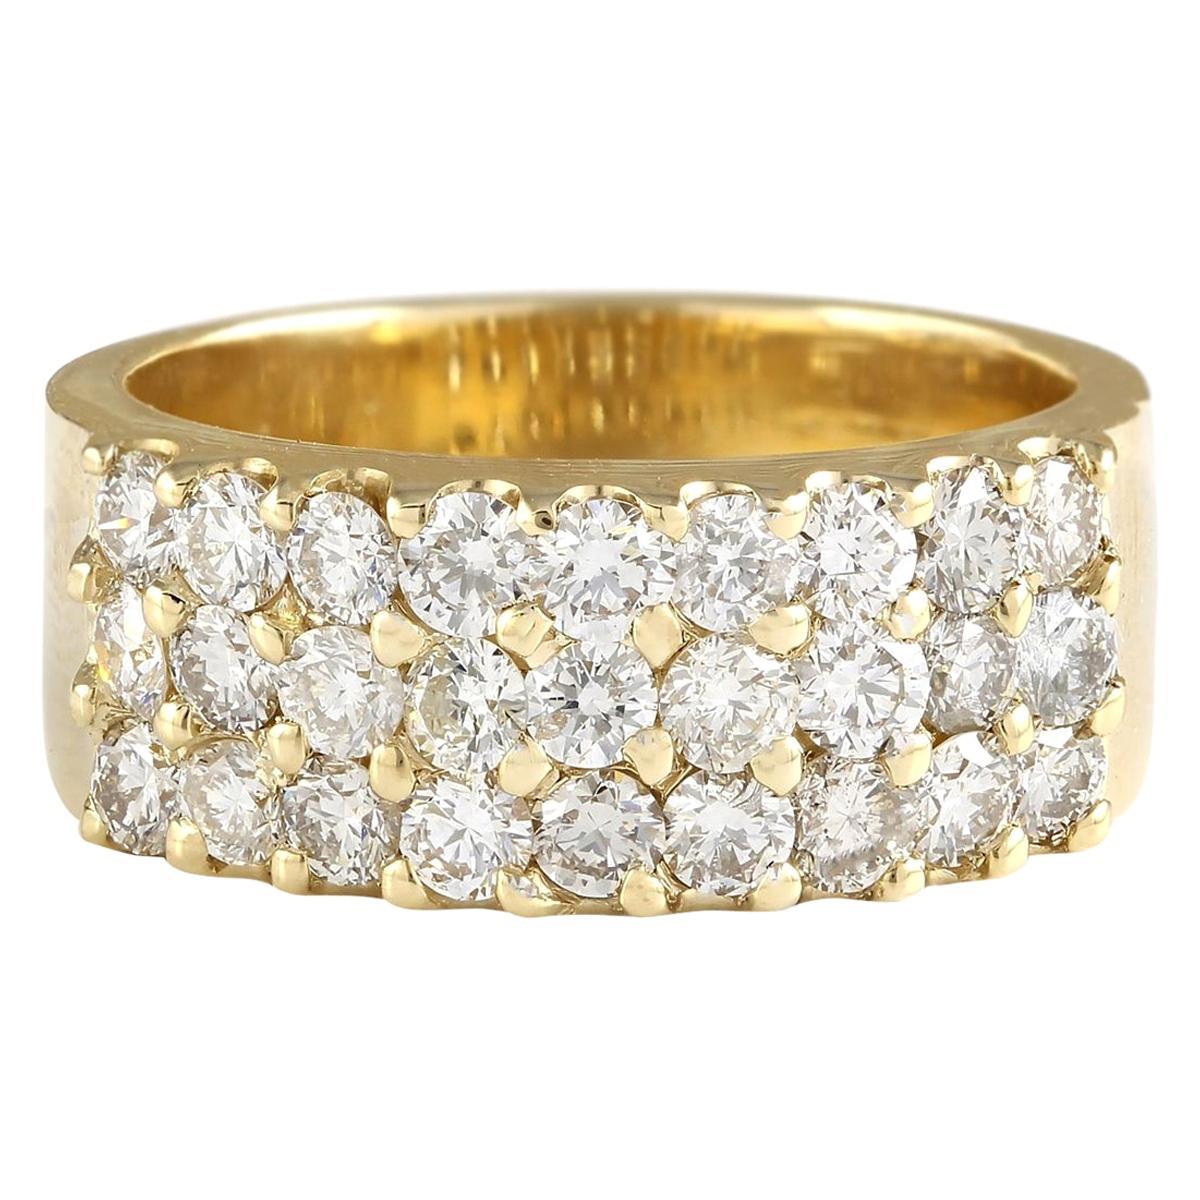 1.40 Carat Natural Diamond 18 Karat Yellow Gold Ring